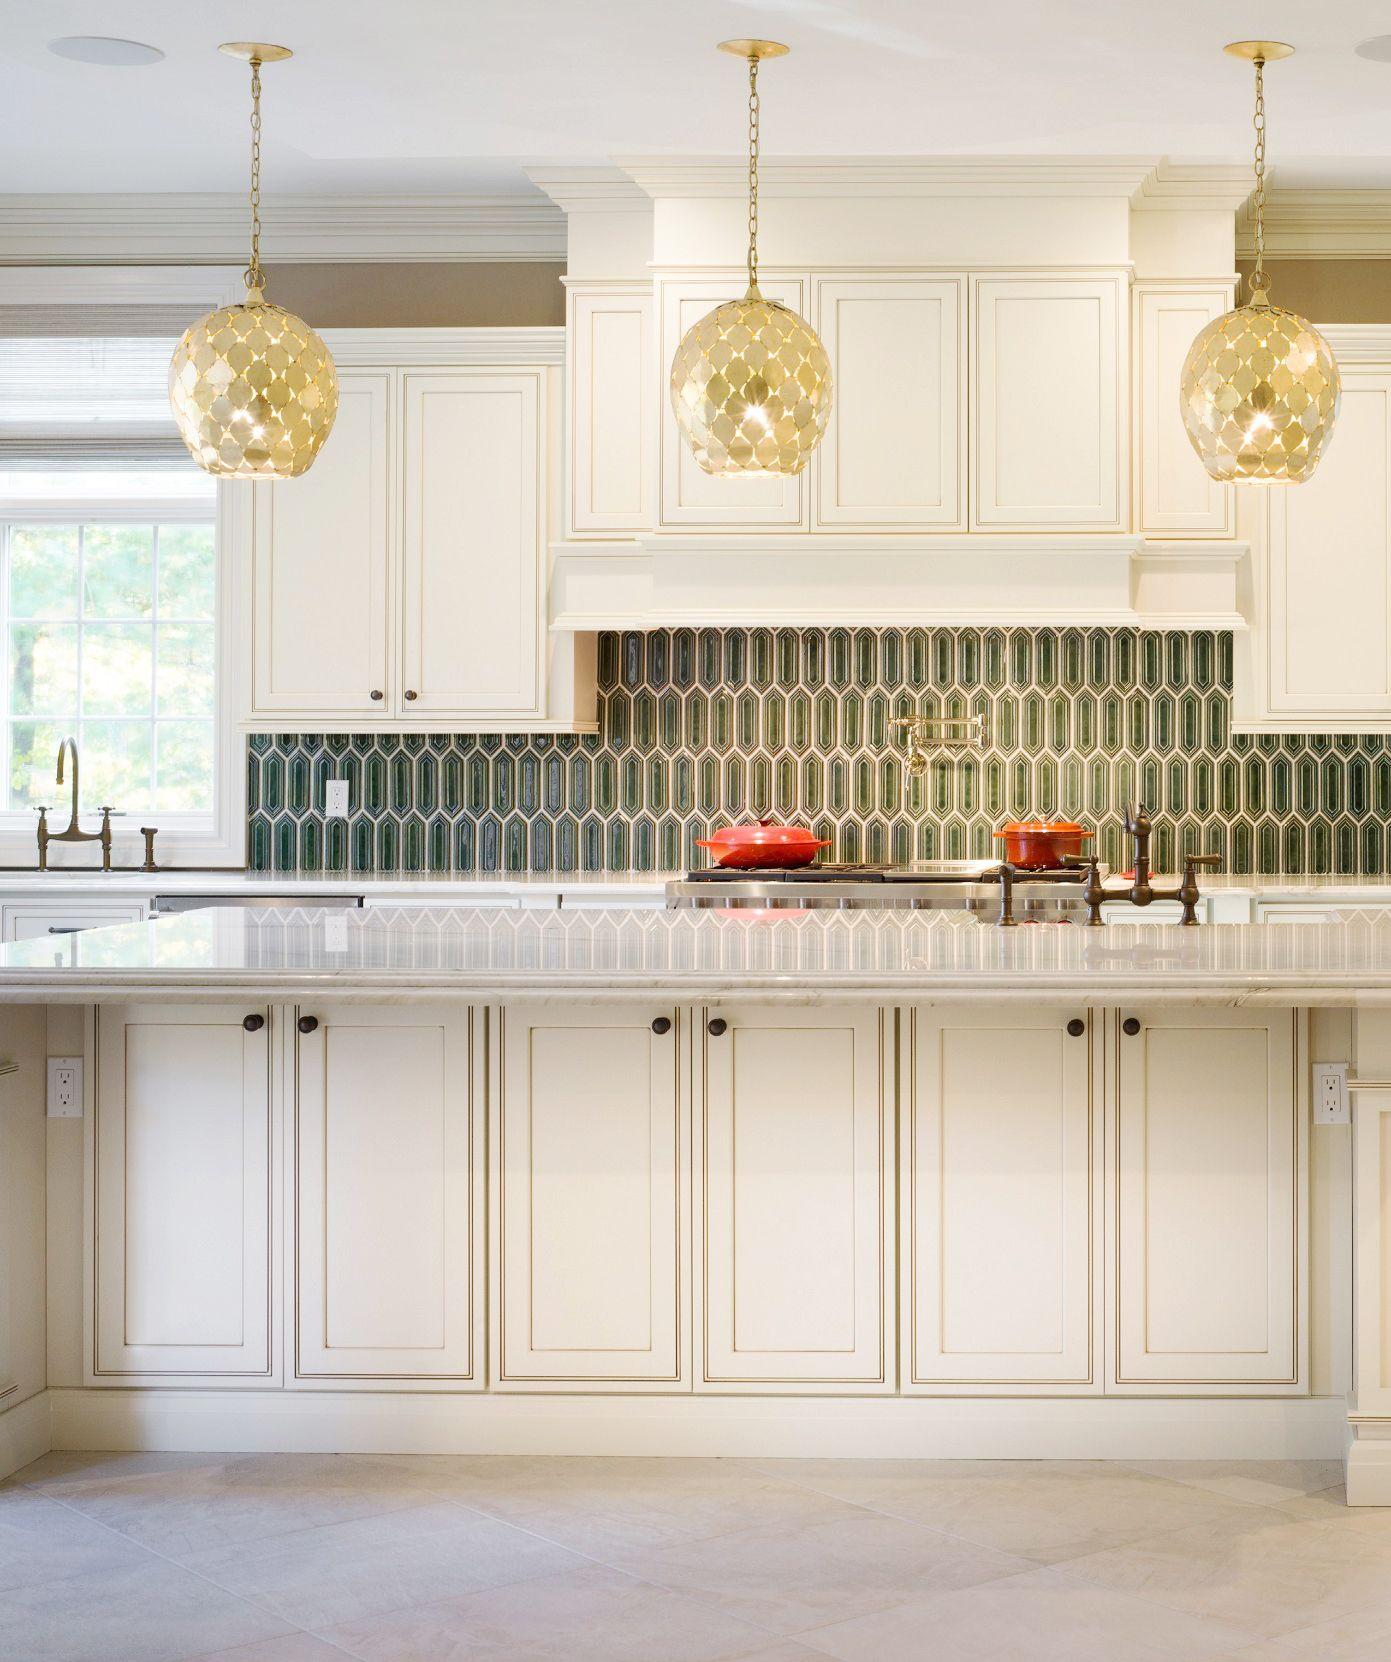 Pearl Maple Glazed | Maple kitchen cabinets, Maple kitchen ...